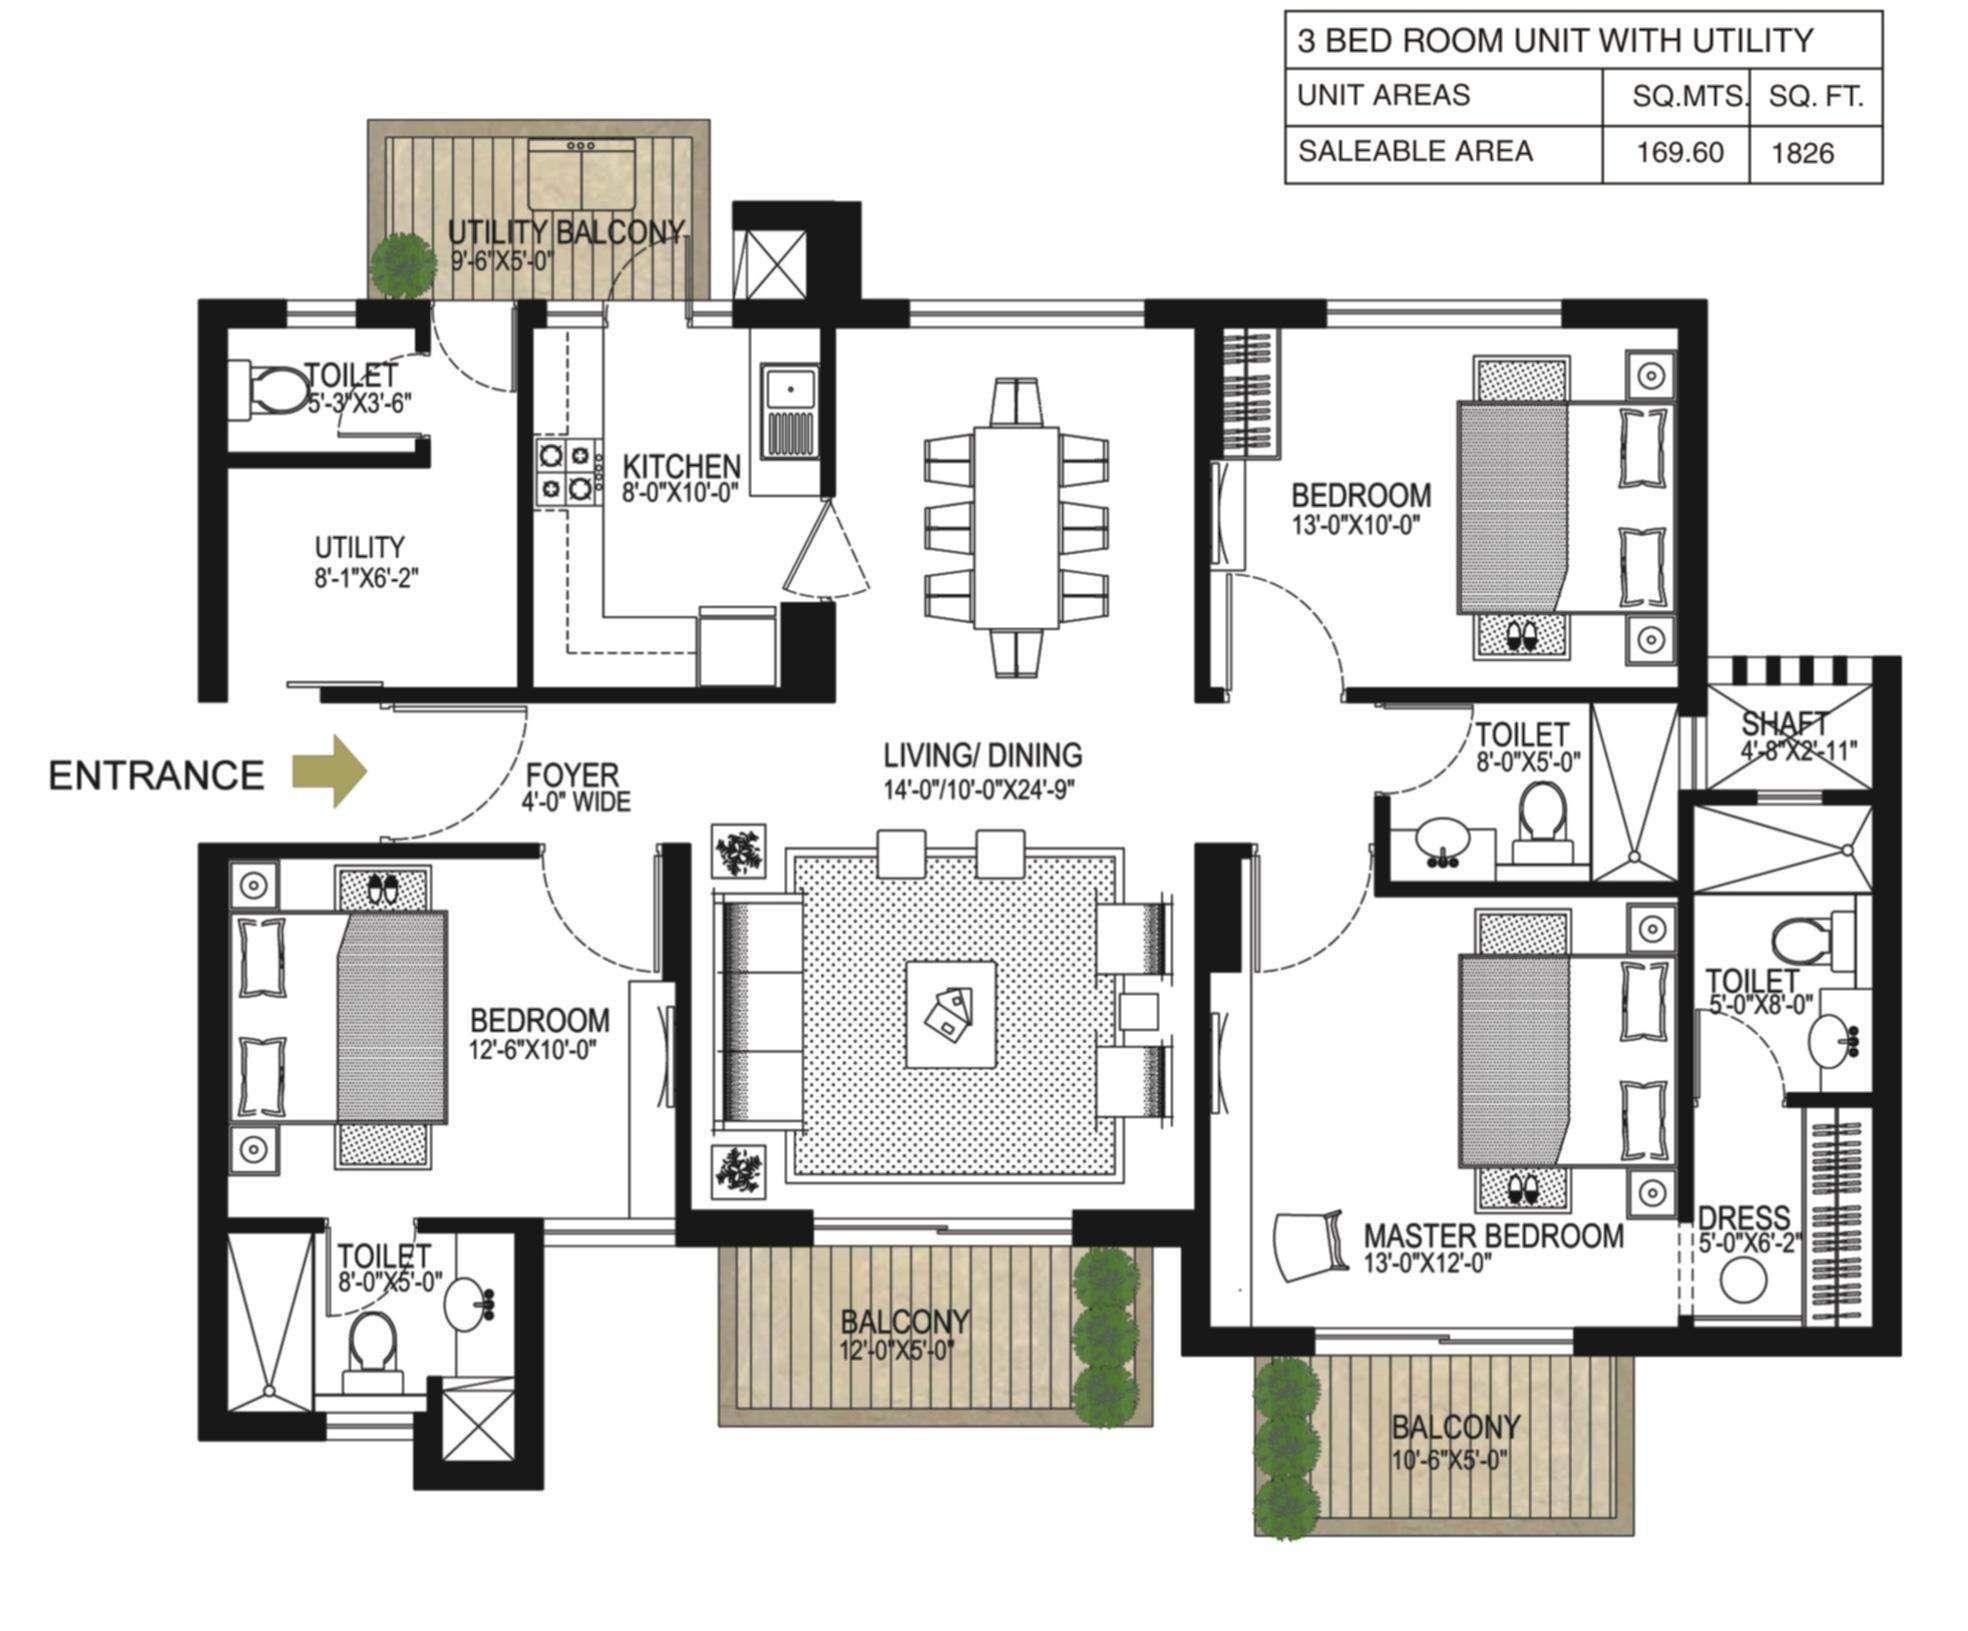 alpha-g-corp-gurgaon-one-84-floor-plan-3bhk-3t-1826-sq-ft-216538 ...